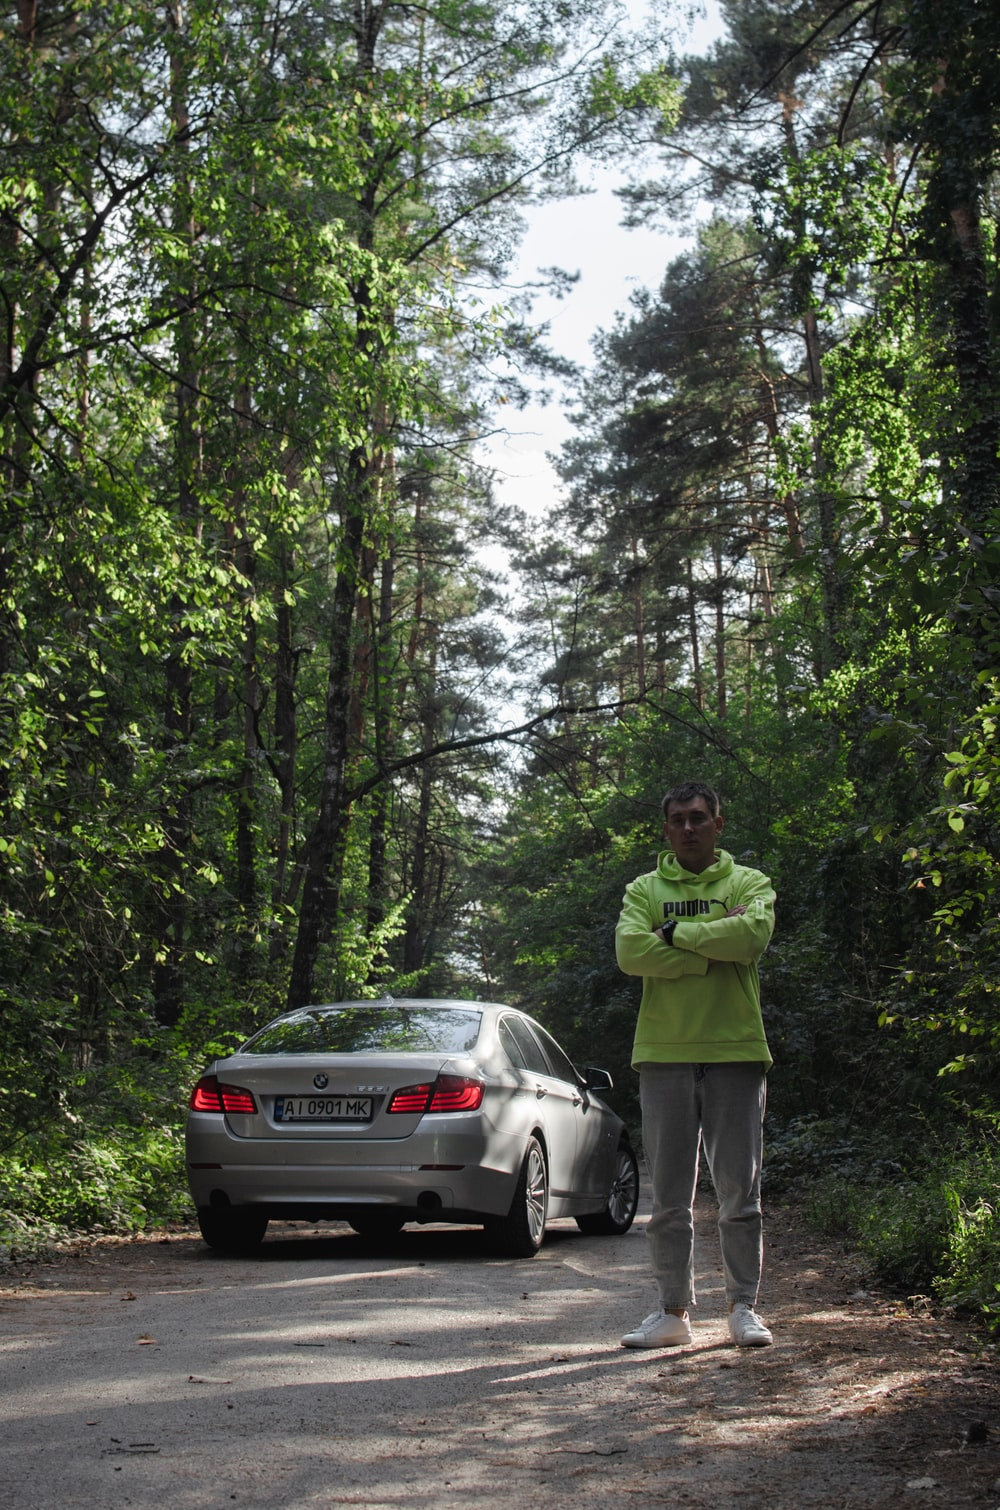 man in green jacket standing beside silver car